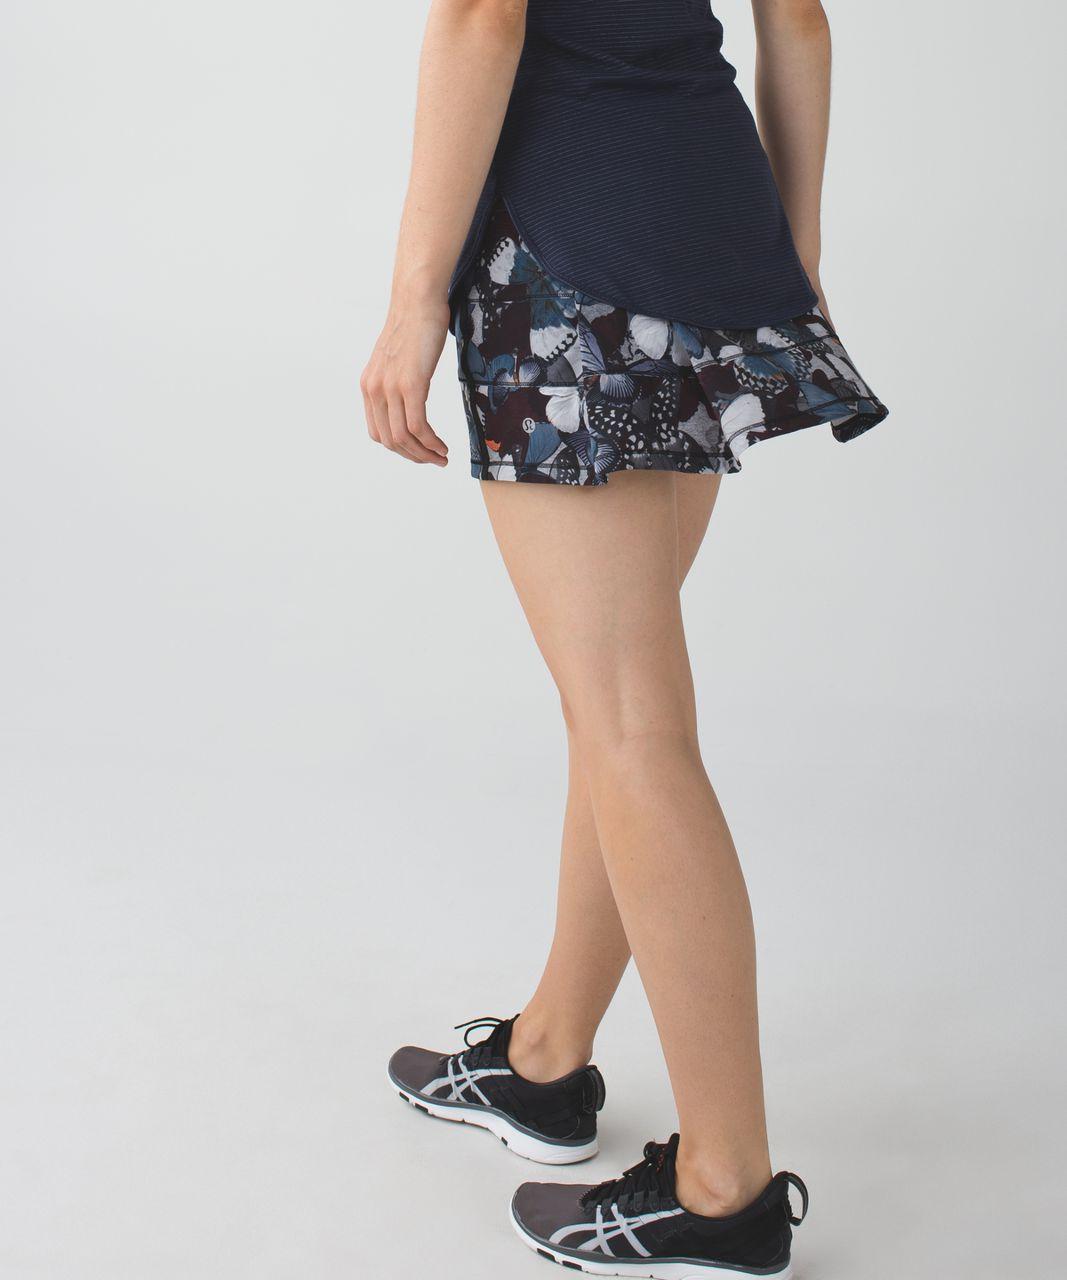 Lululemon Pace Rival Skirt II (Regular) *4-way Stretch - Biggie So Fly Butterfly Pizzaz Multi / Black / Pizzaz